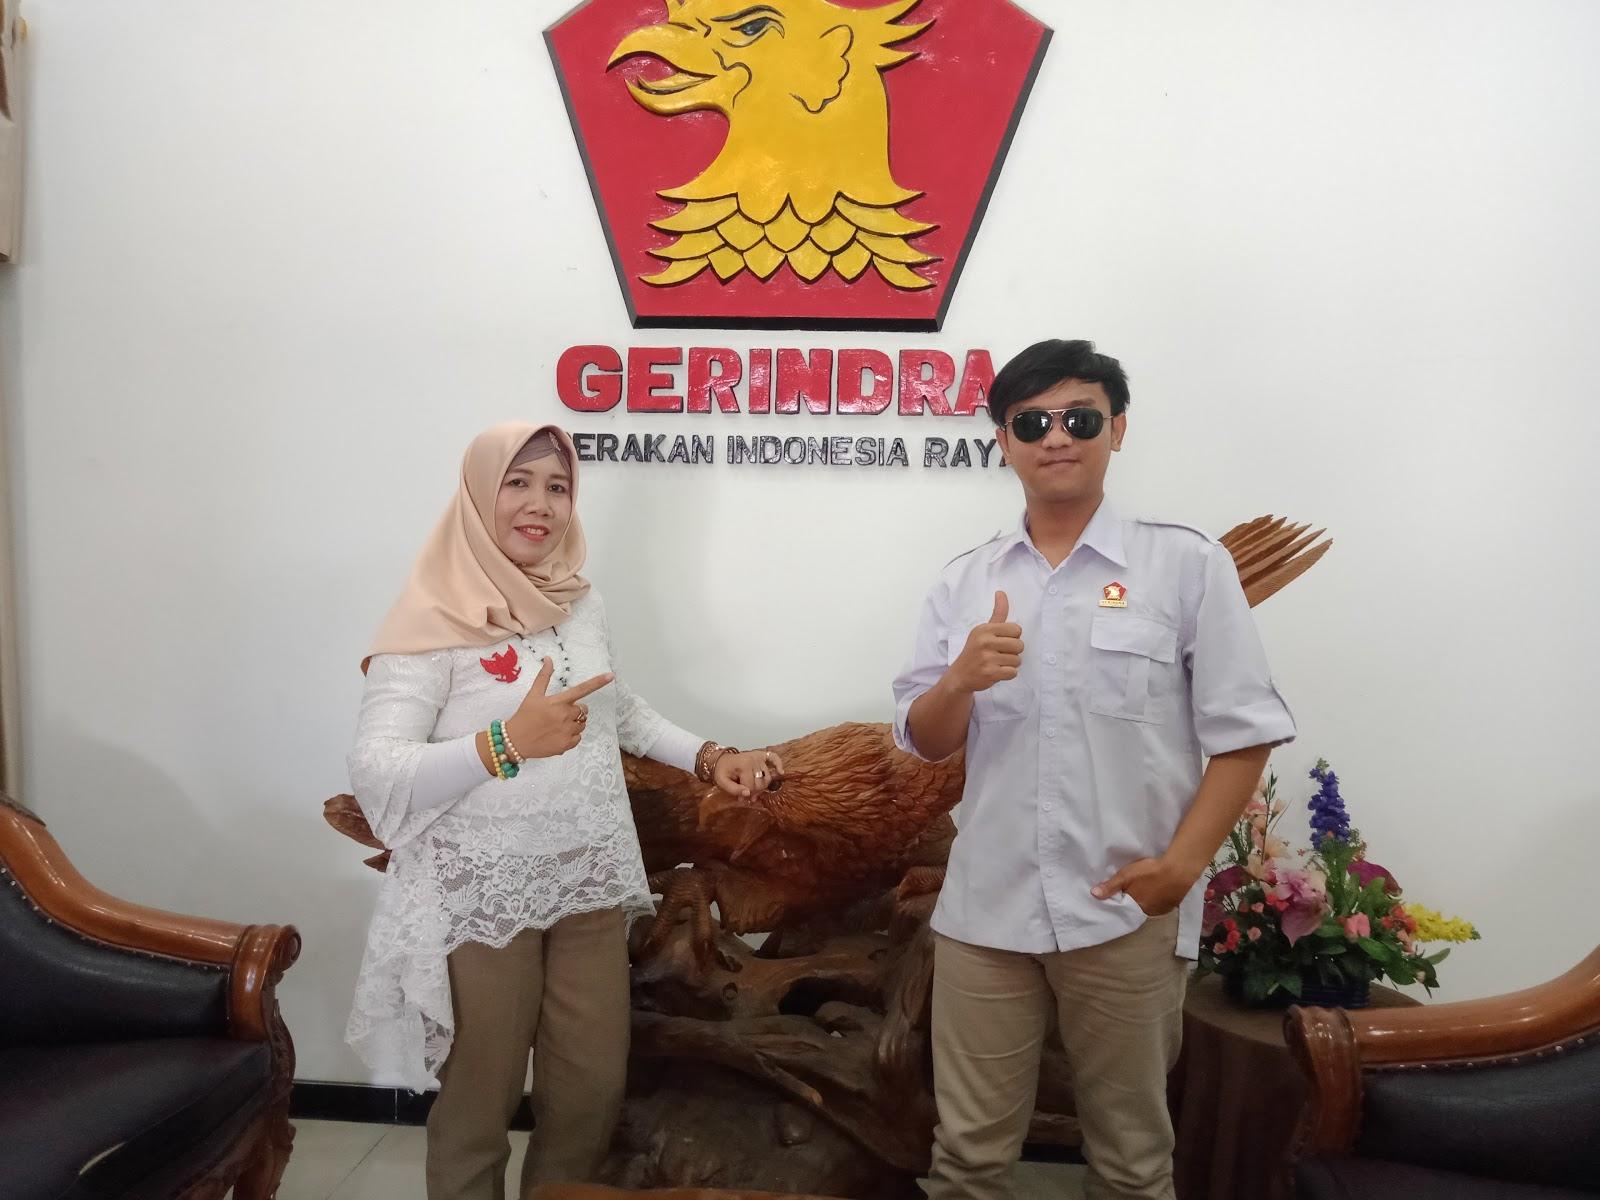 Perempuan Indonesia Raya (PIRA)